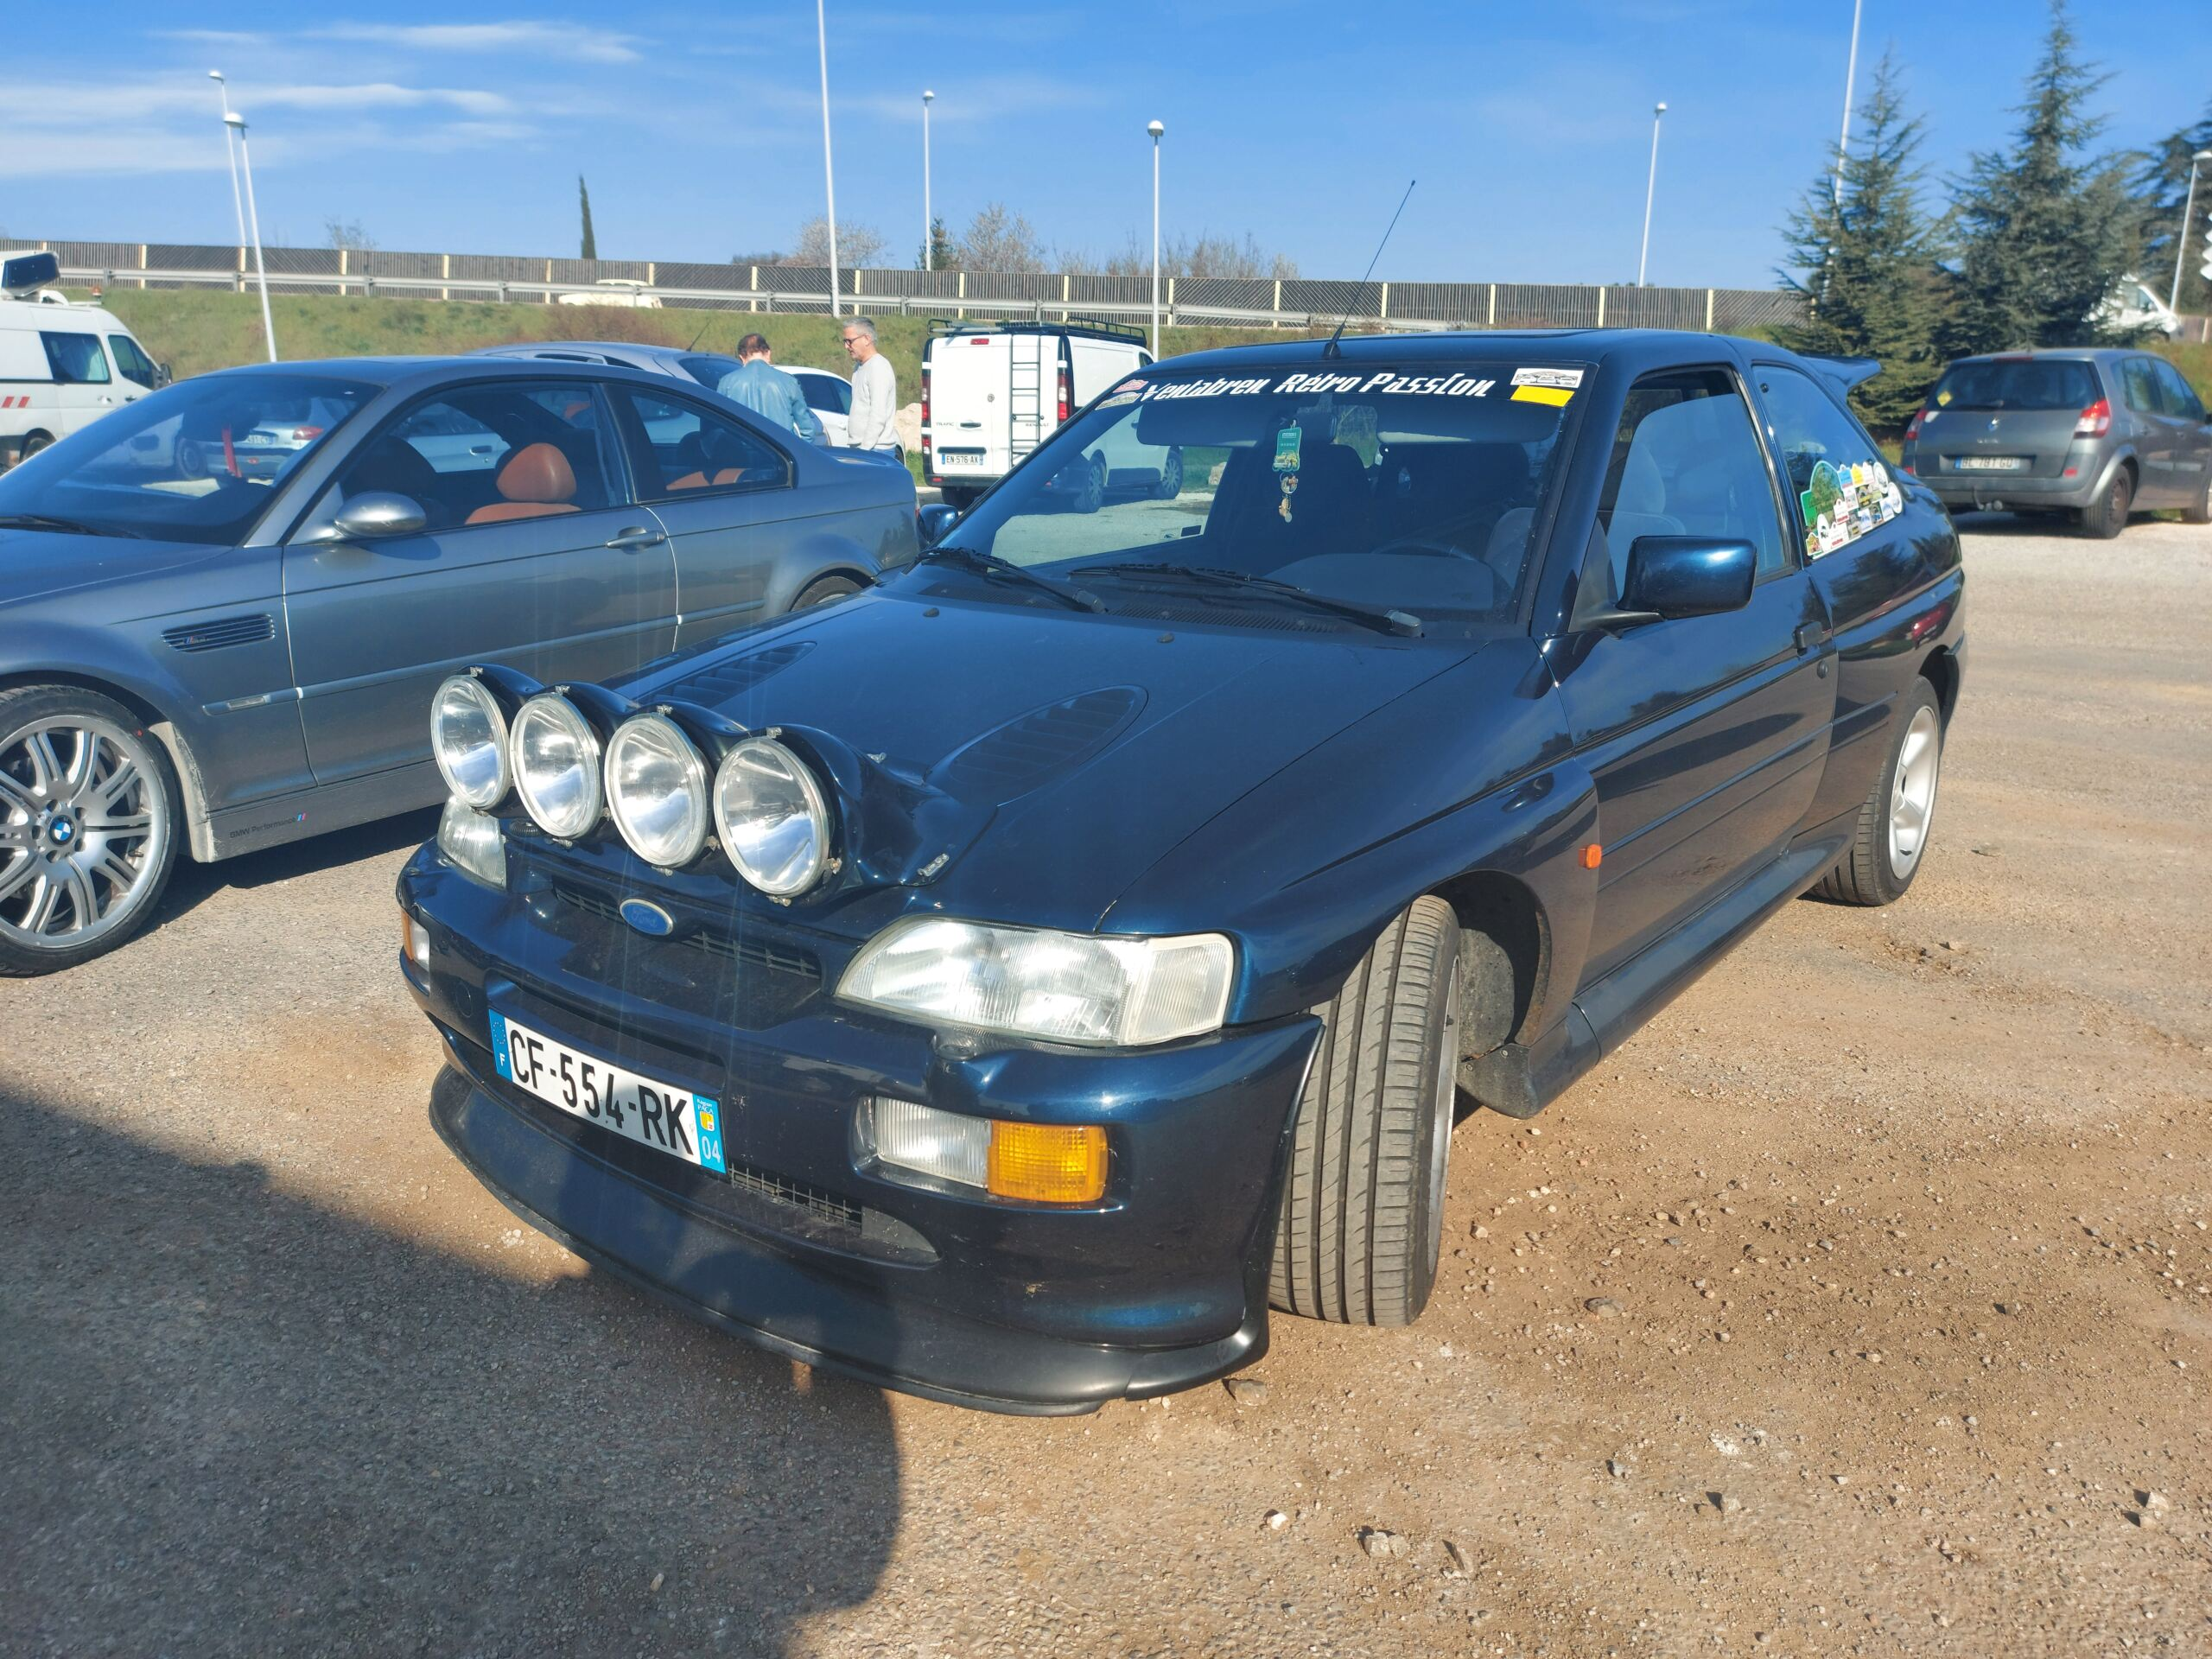 [jean-luc13] 205 Rallye Blanc Meije 1989 - Page 29 20210318